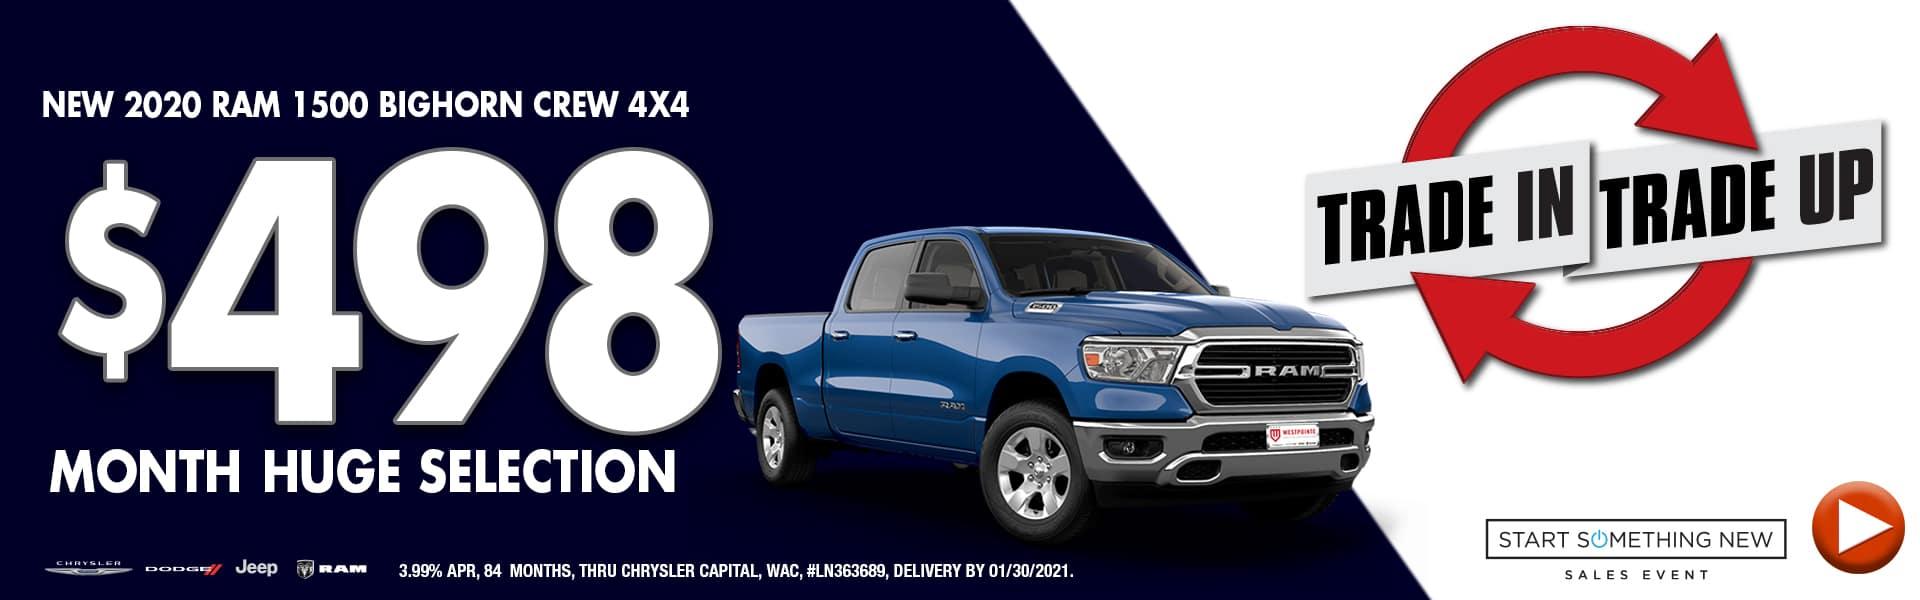 Blue Ram Bighorn 1500